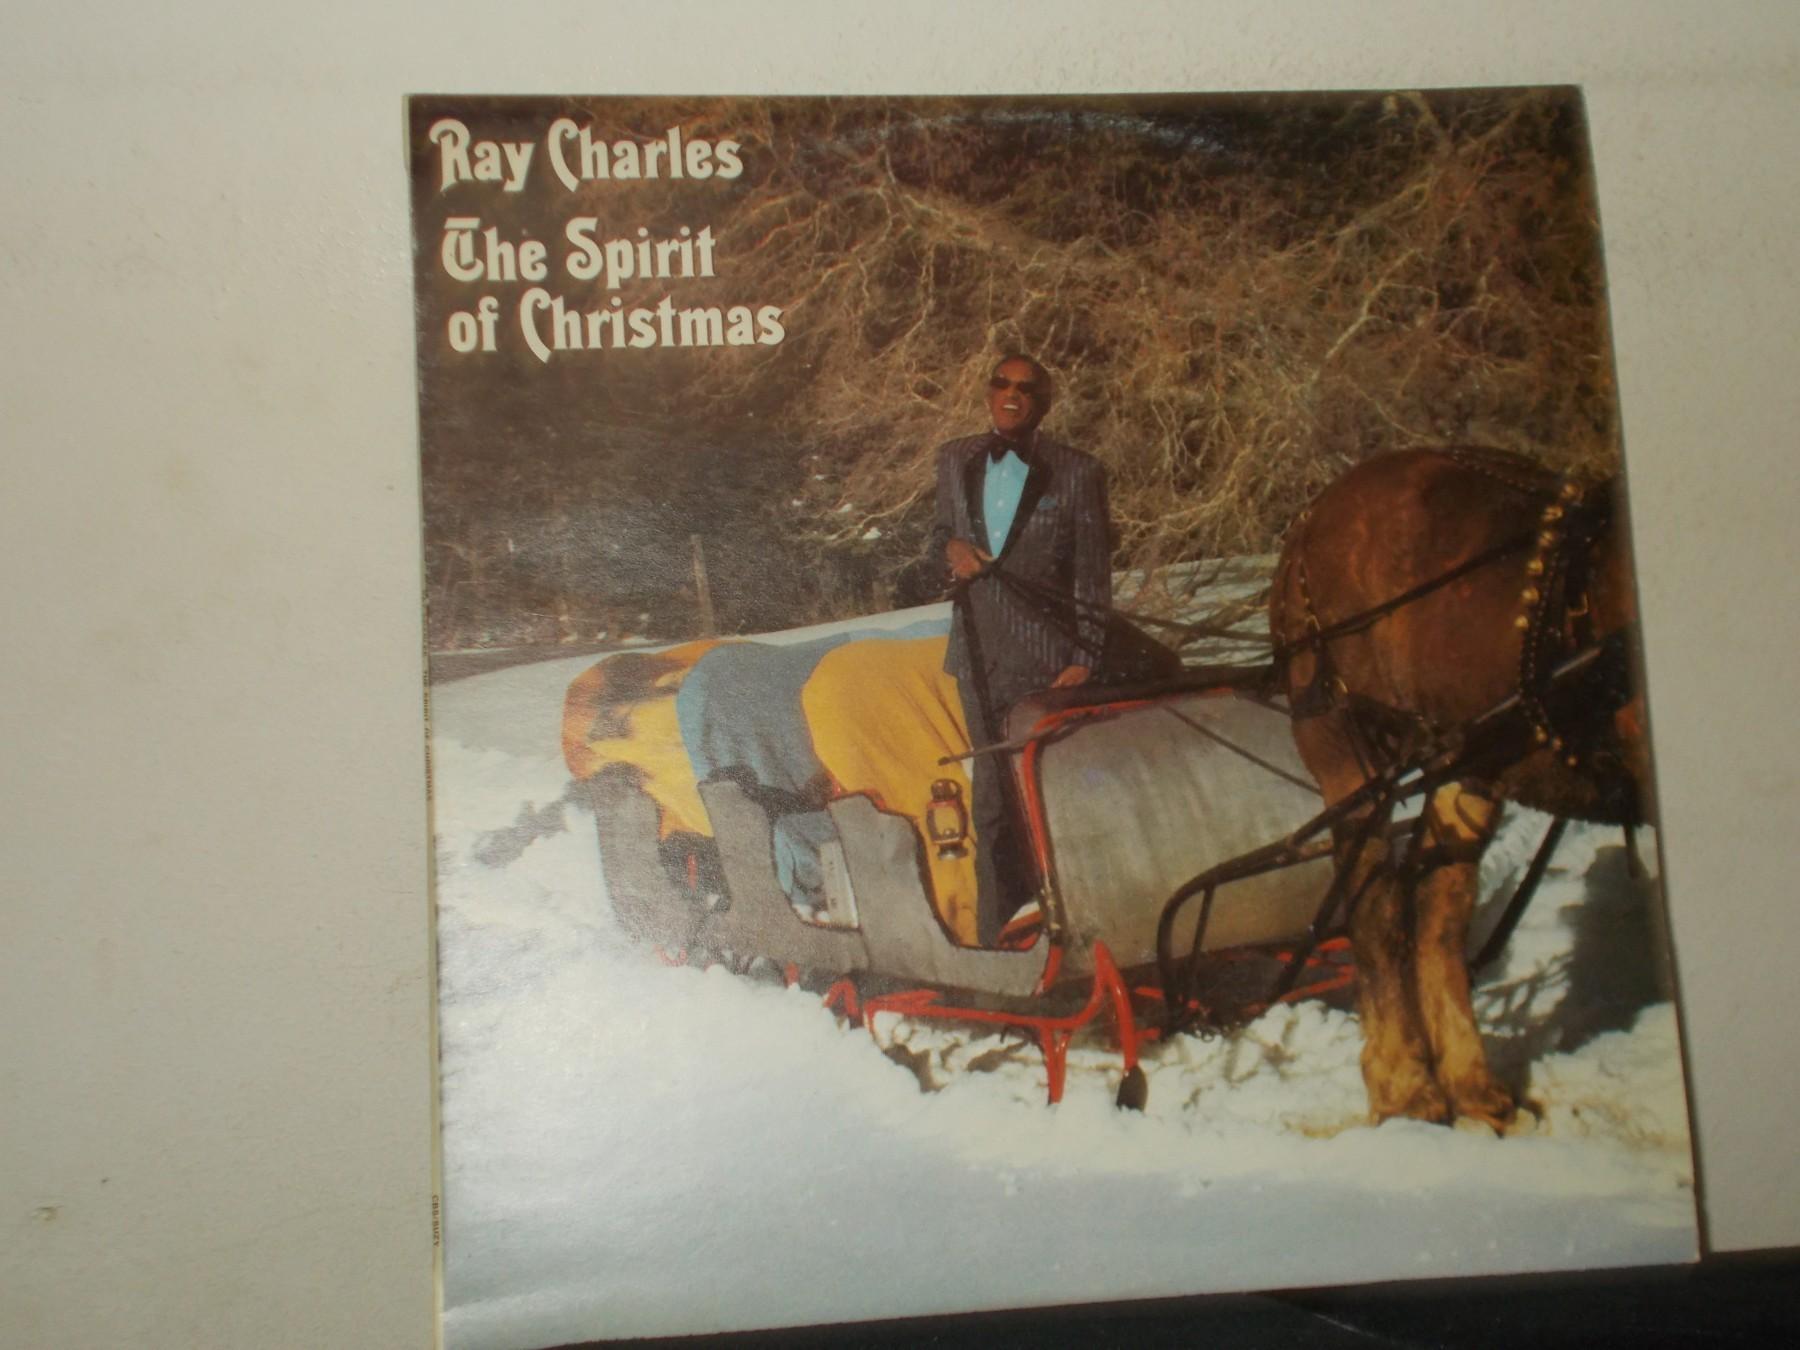 ray charles the spirit of christmas - Ray Charles The Spirit Of Christmas